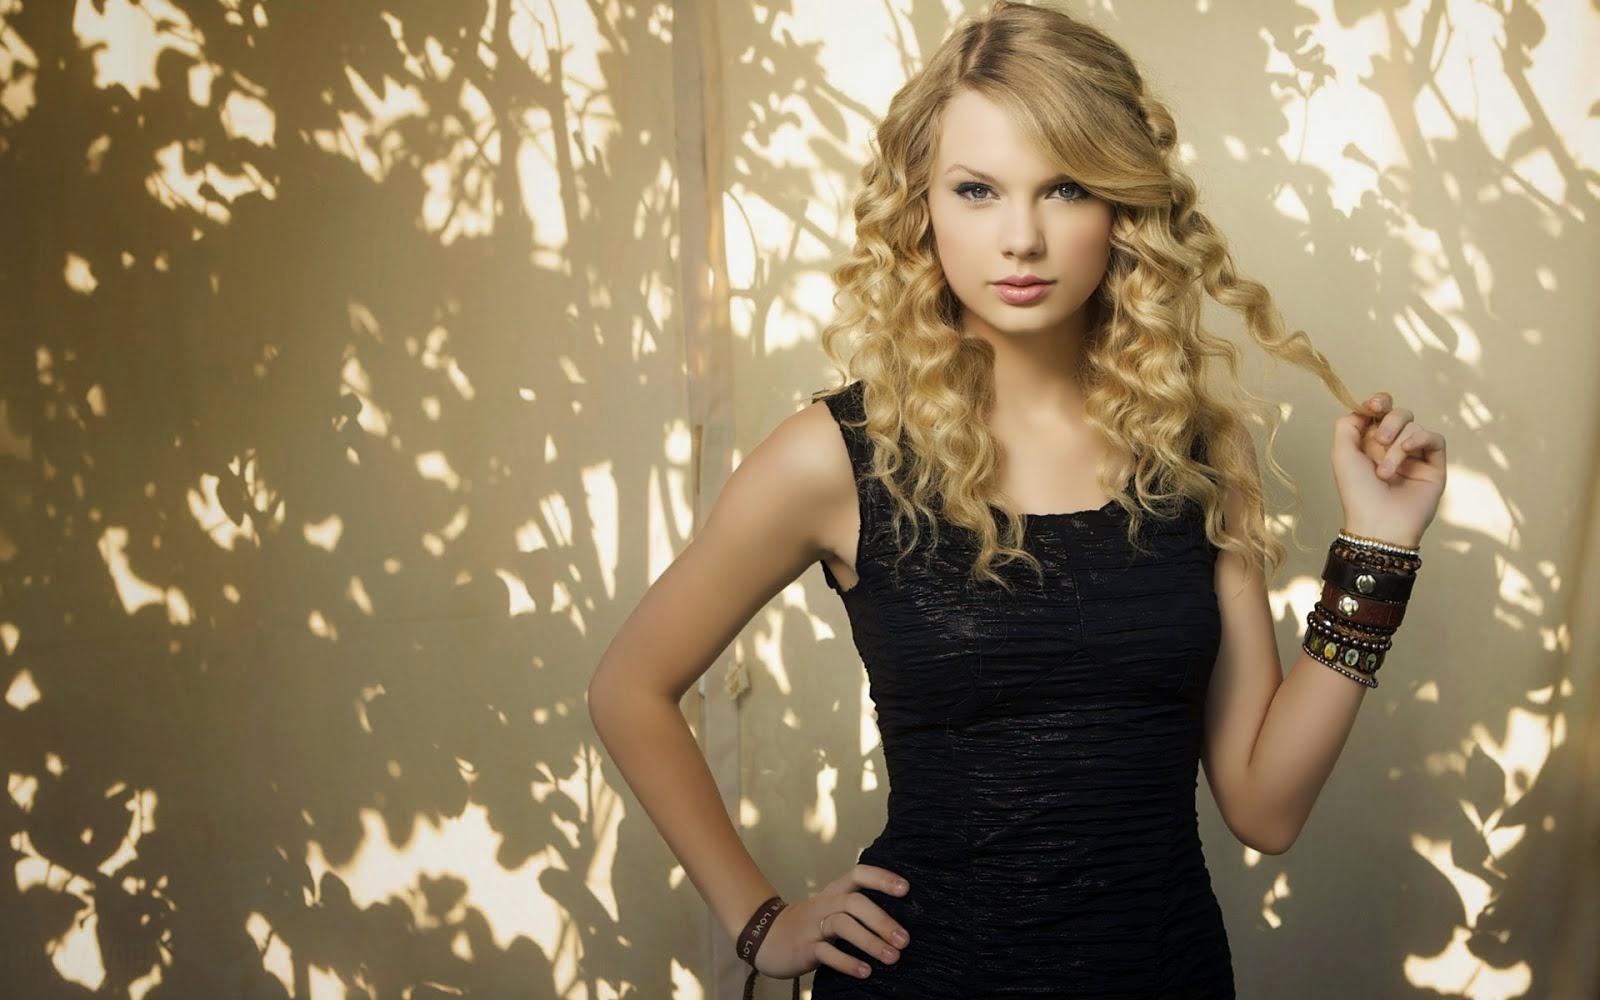 Taylor Swift Wallpapers Hd Taylor Swift Wallpaper Hot 1600x1000 Download Hd Wallpaper Wallpapertip